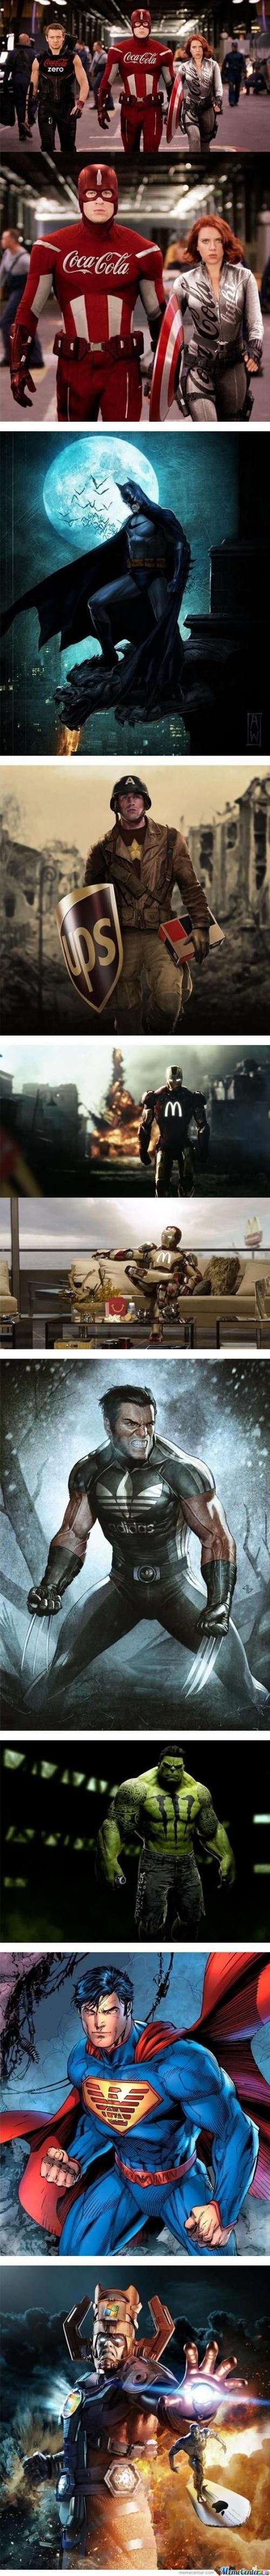 If Superheros Had Sponsors Meme | Slapcaption.com